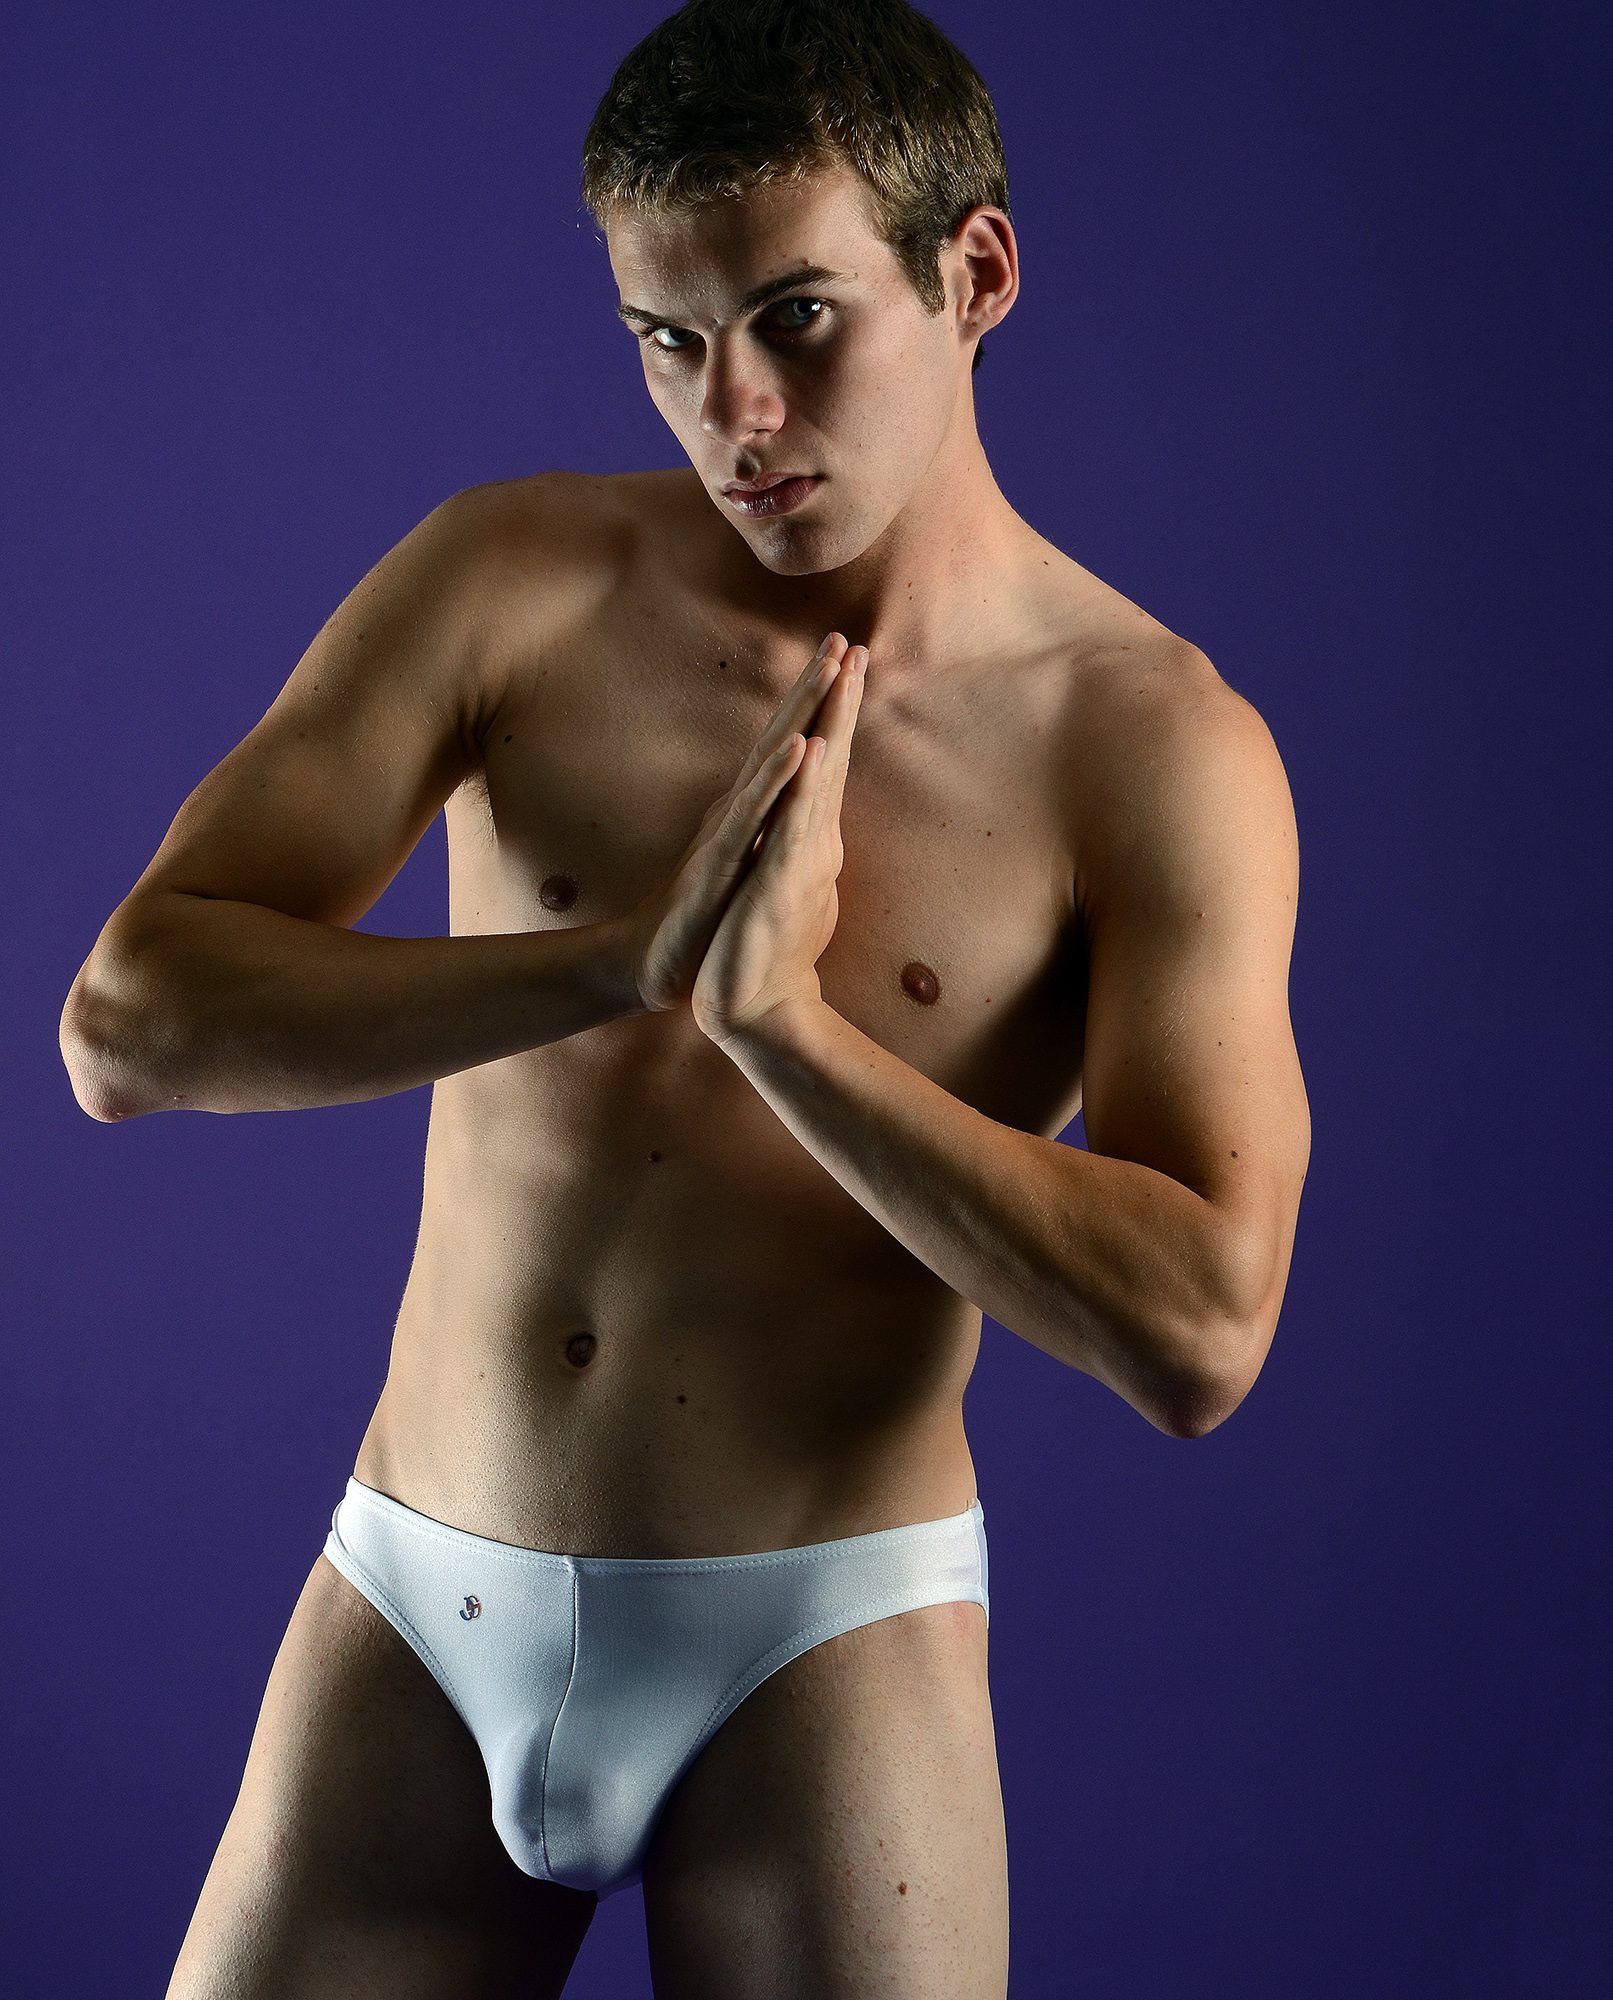 ModelTeenz Cody